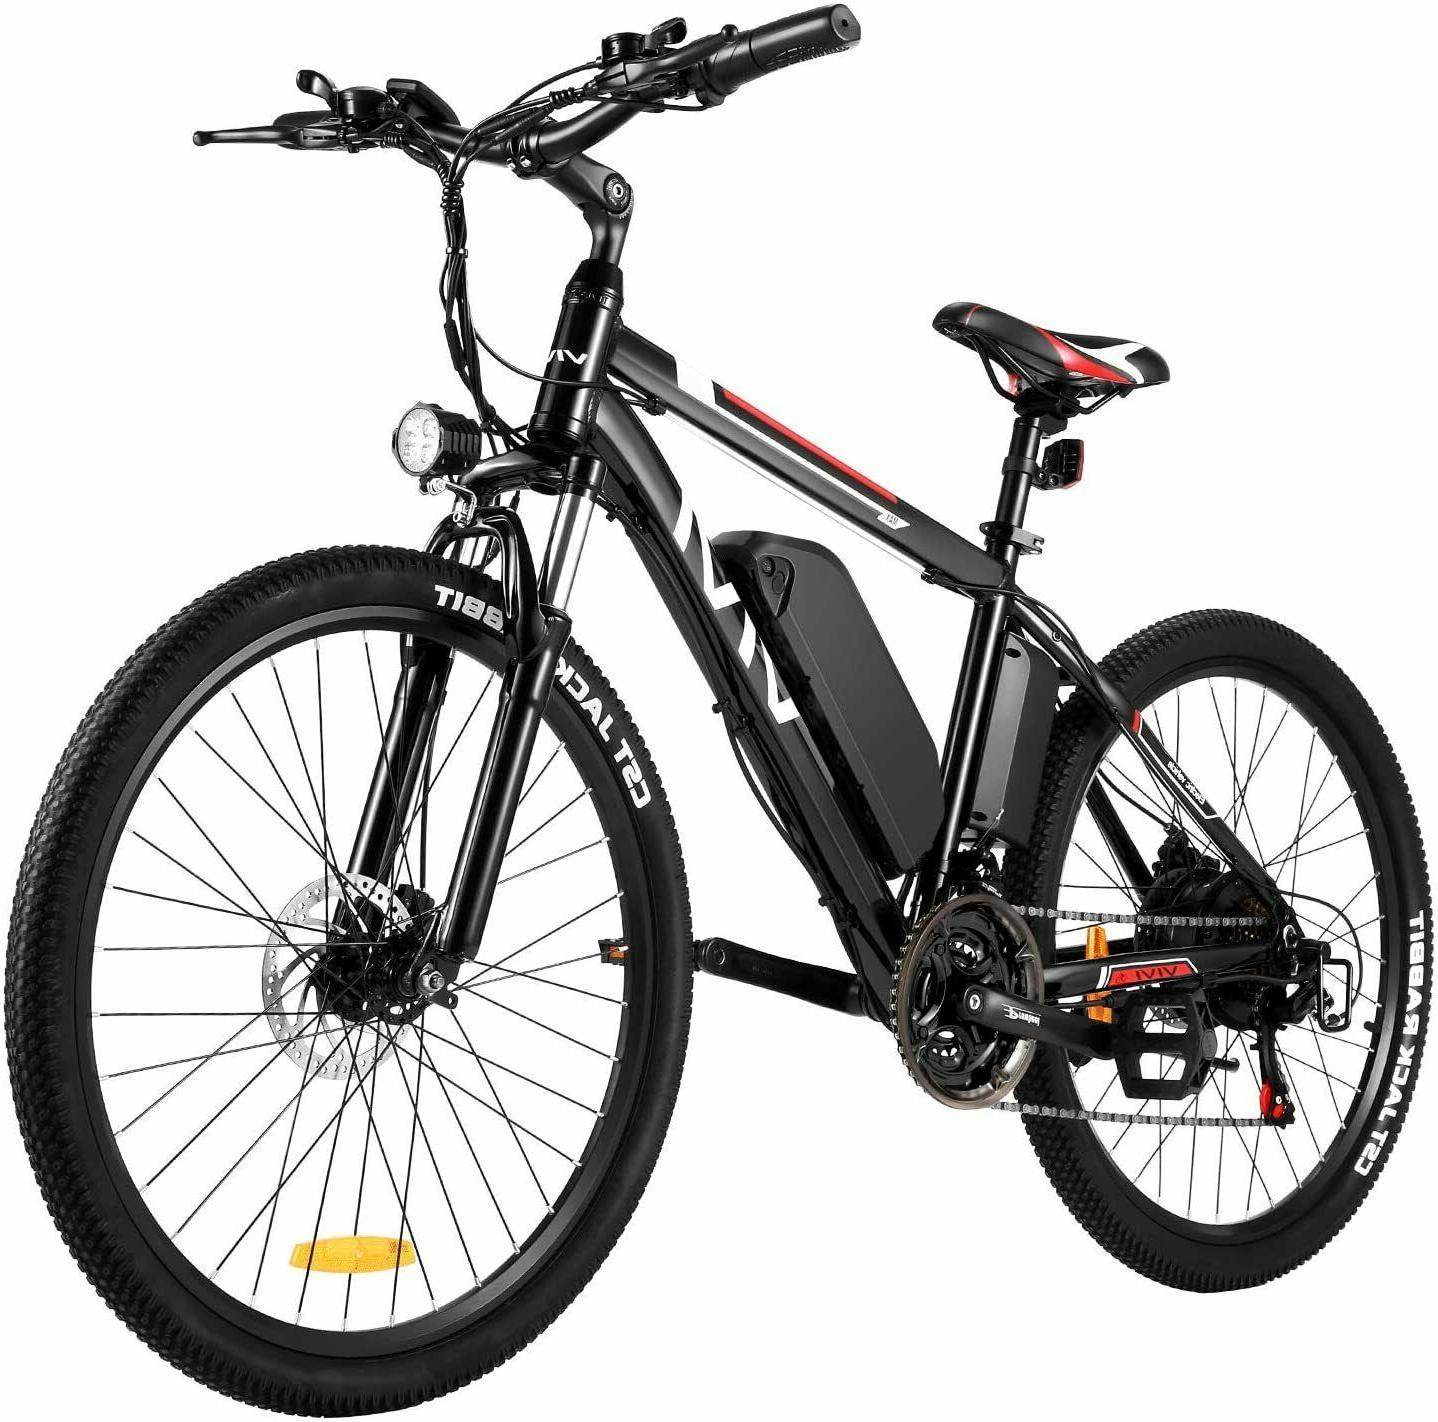 "500W 26"" Electric Mountain Bicycle 21Speed Bike Shimano 48V"